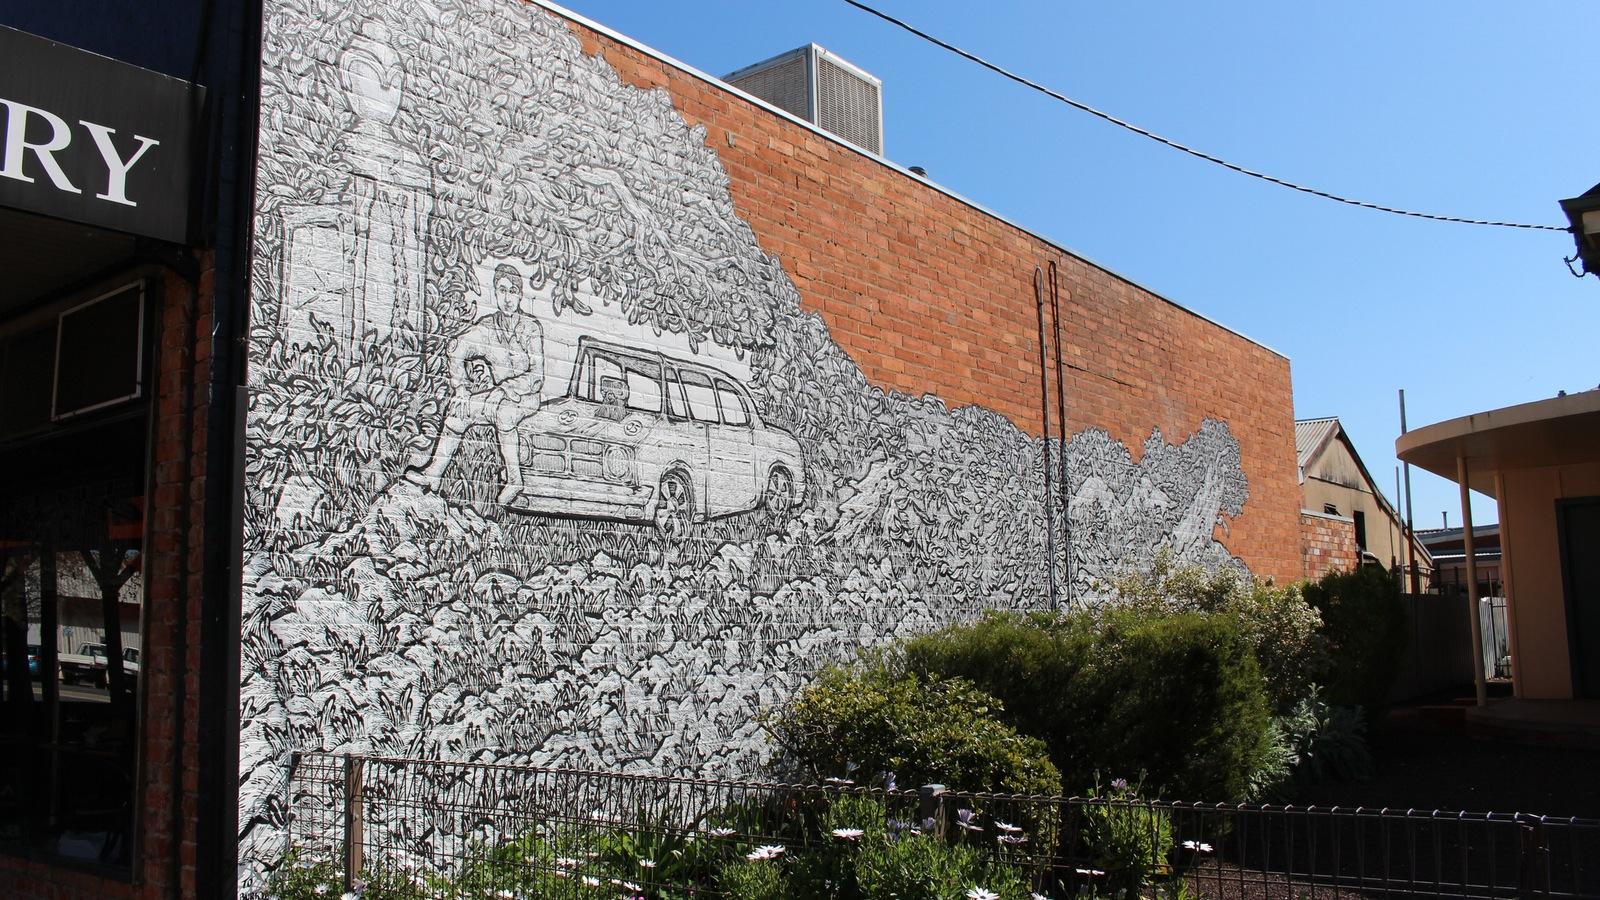 Wall to Wall Street Art